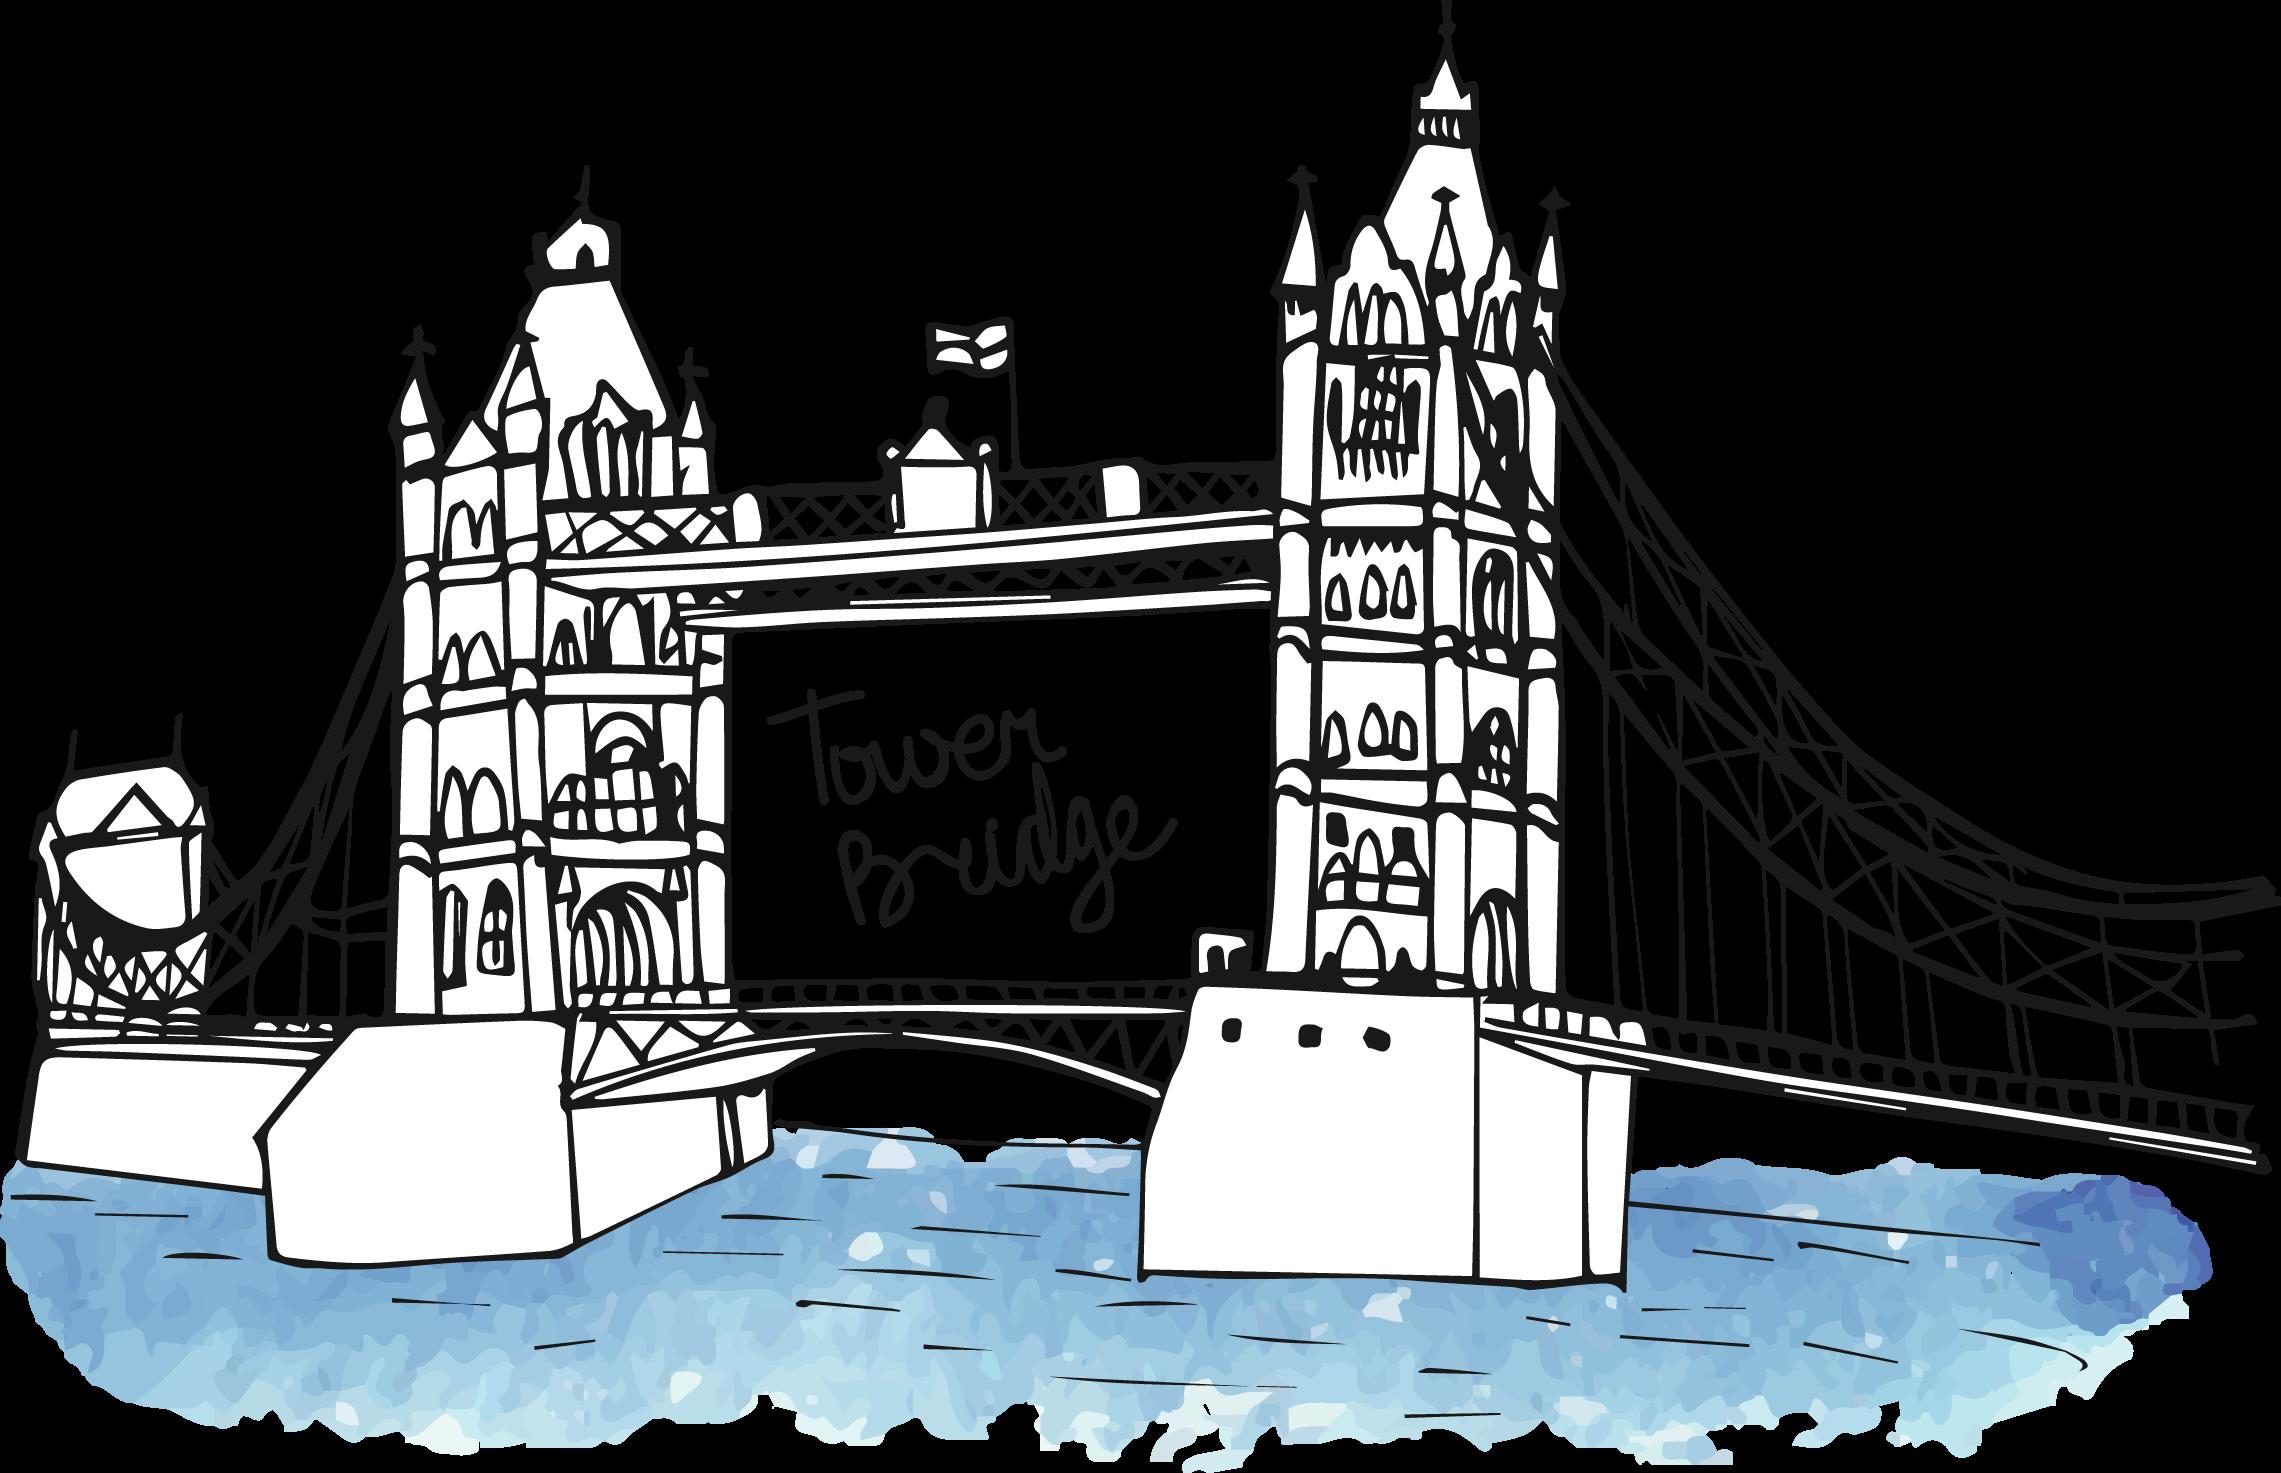 London clipart london bridge. Big ben landmark monument